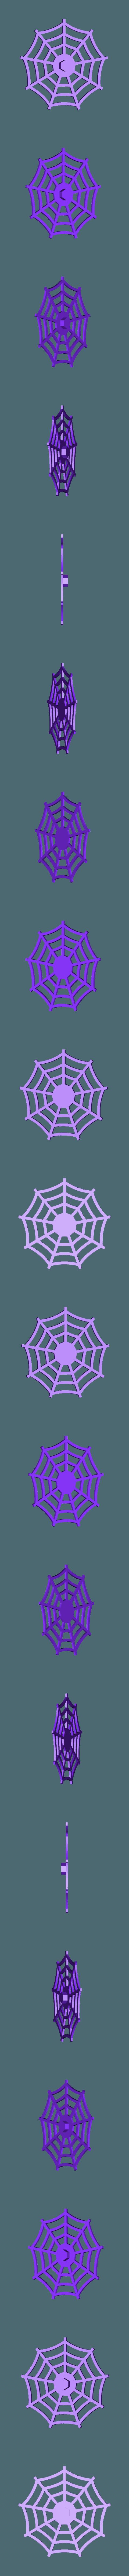 Web.stl Download free STL file Visions of Halloween Danced In Her (His) Head, Motorized • 3D printing template, gzumwalt